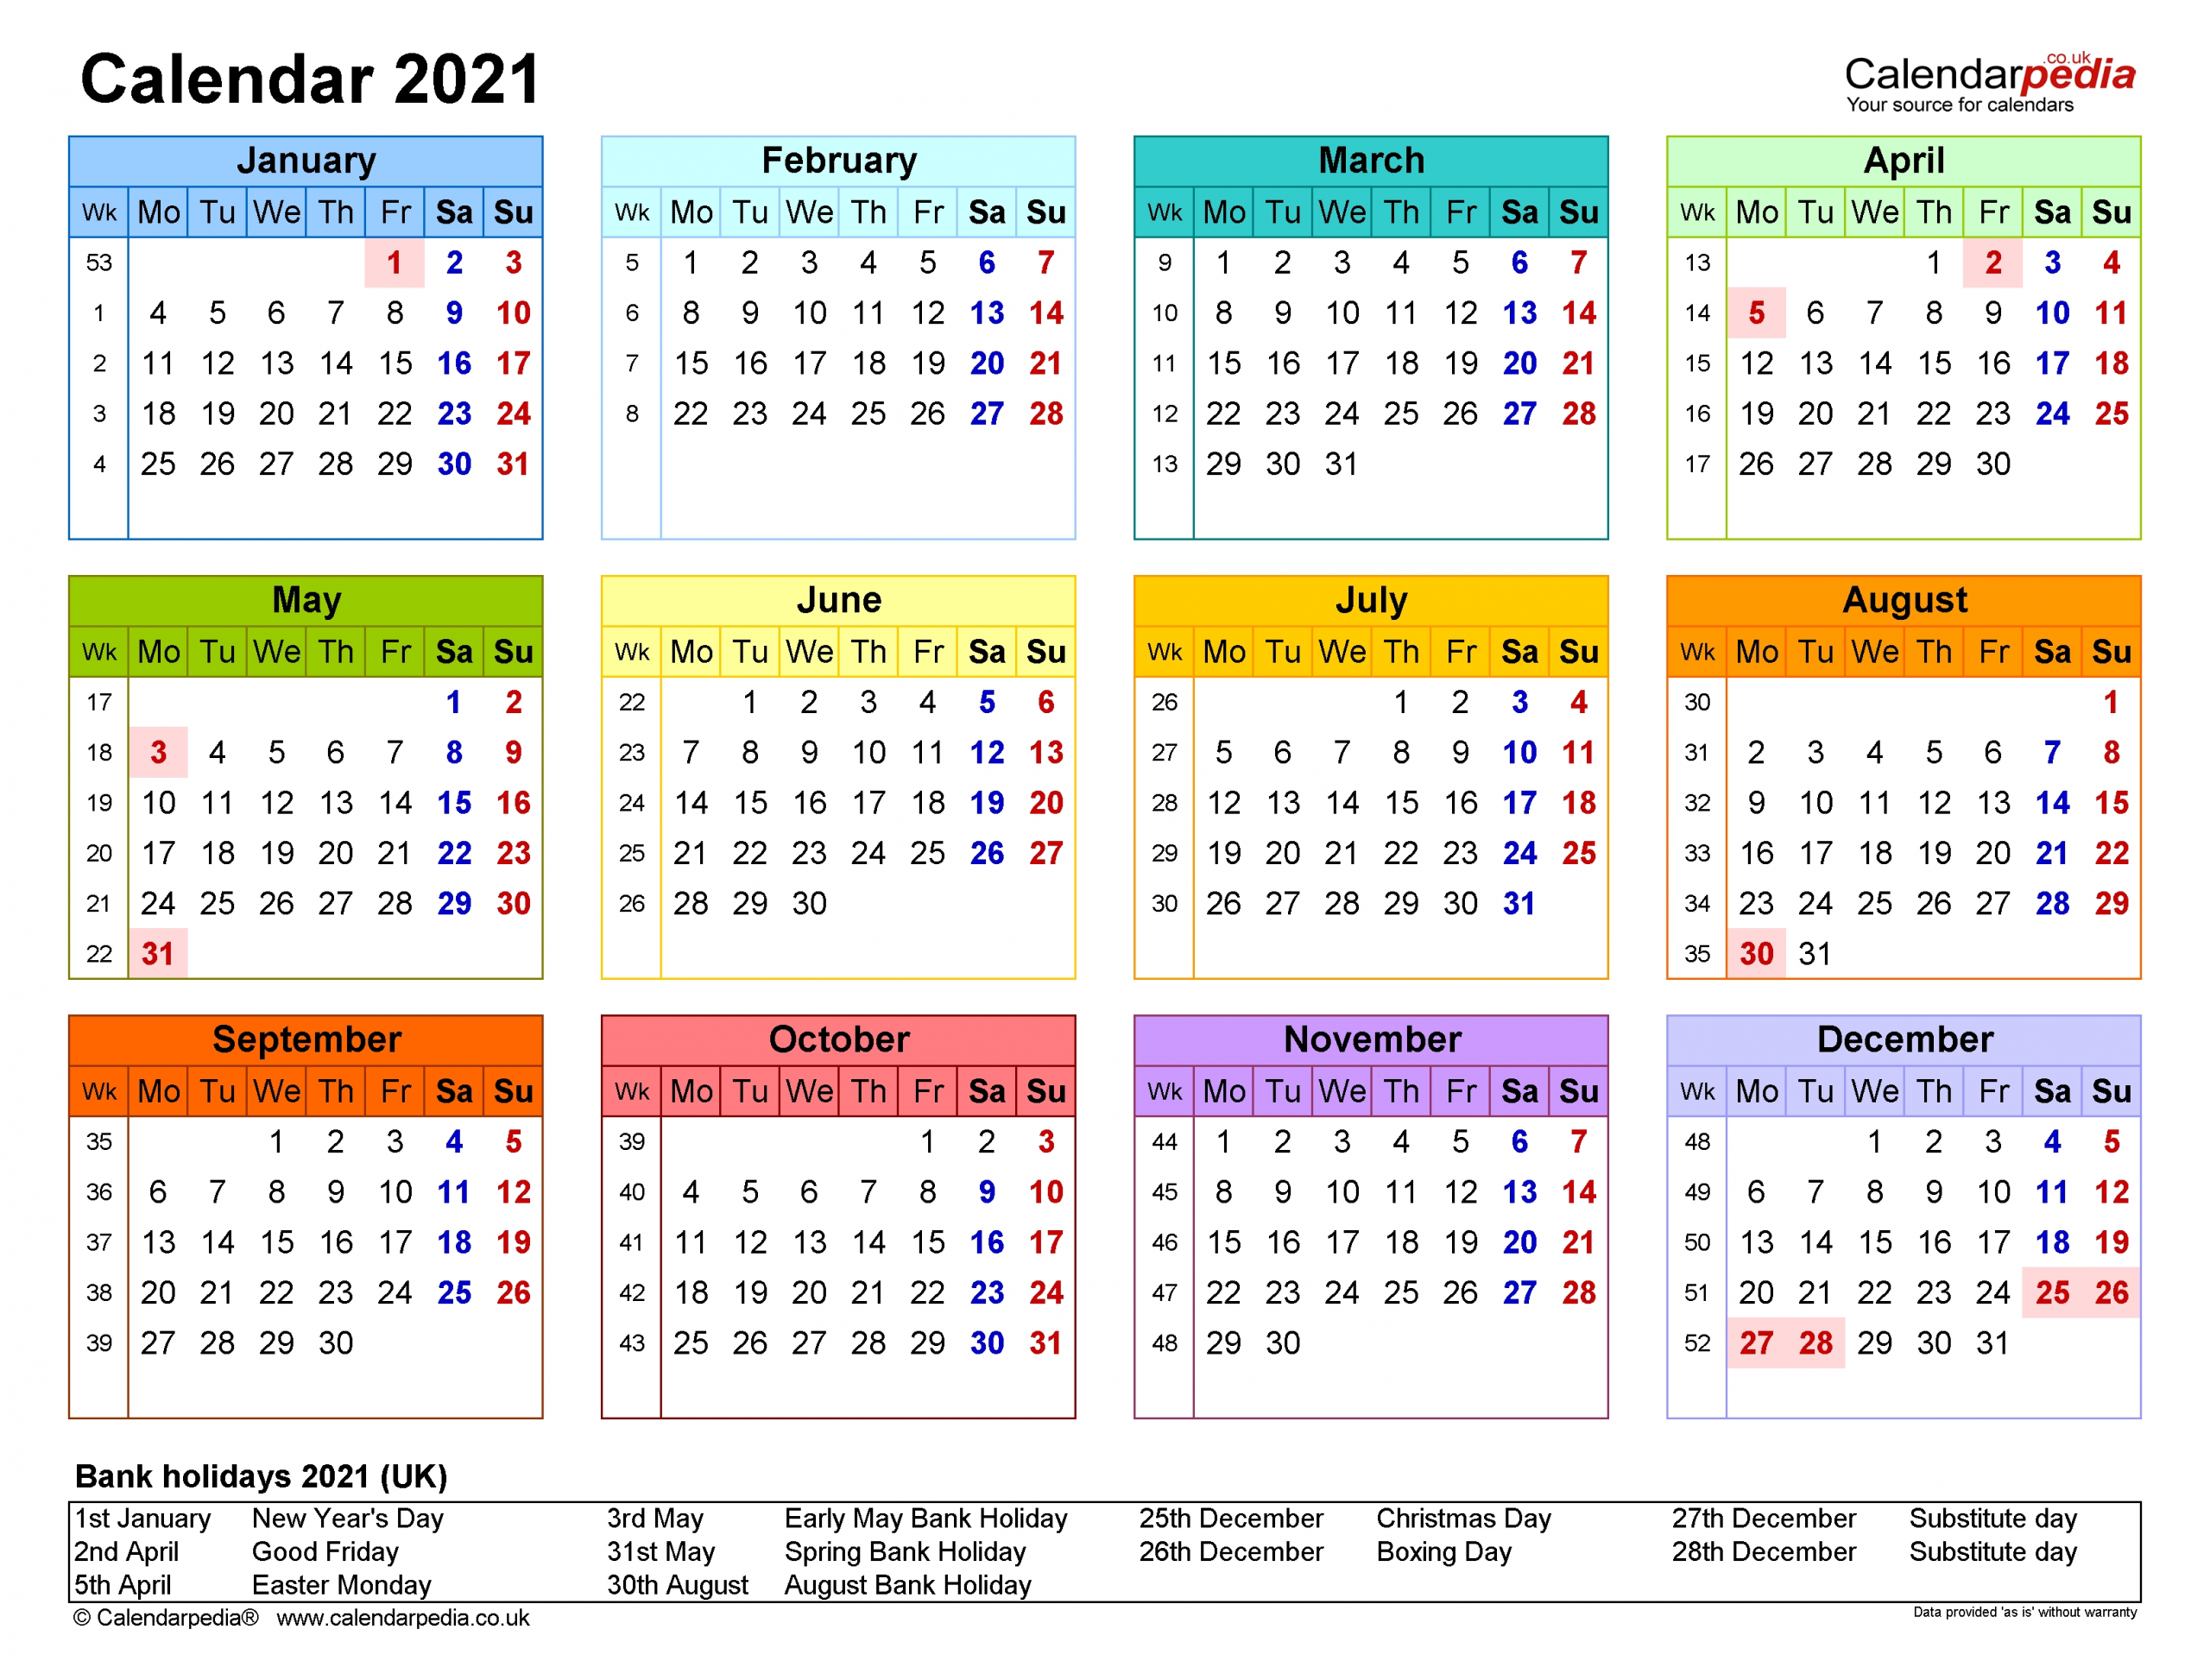 Calendar 2021 (Uk) - Free Printable Microsoft Word Templates for 2021 2022 Calendar Printable One Page